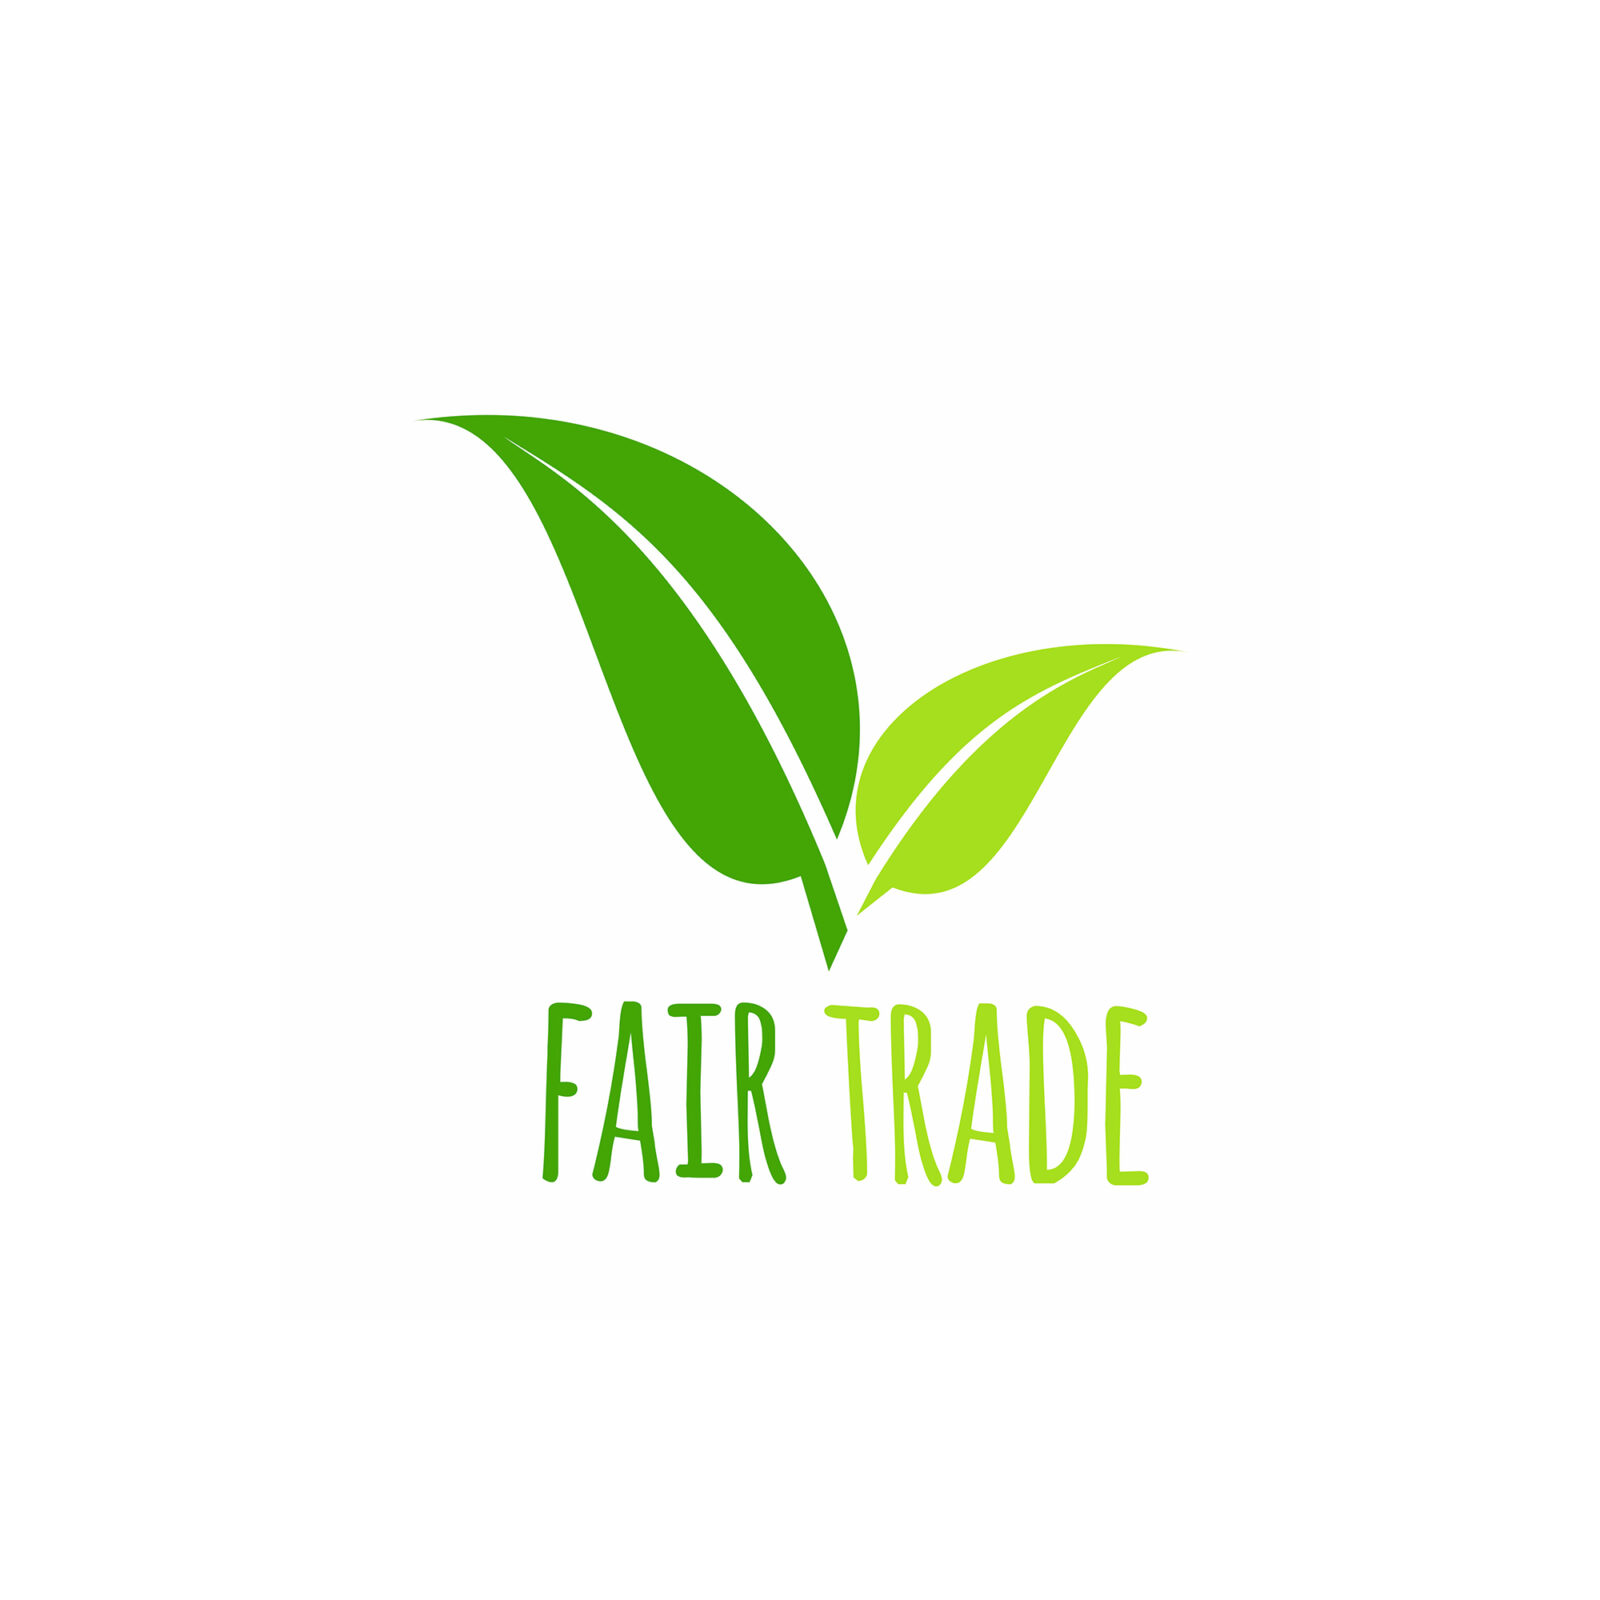 https://www.ccifrance-allemagne.fr/wp-content/uploads/2021/04/commerce_equitable_fair_trade_2-scaled.jpg